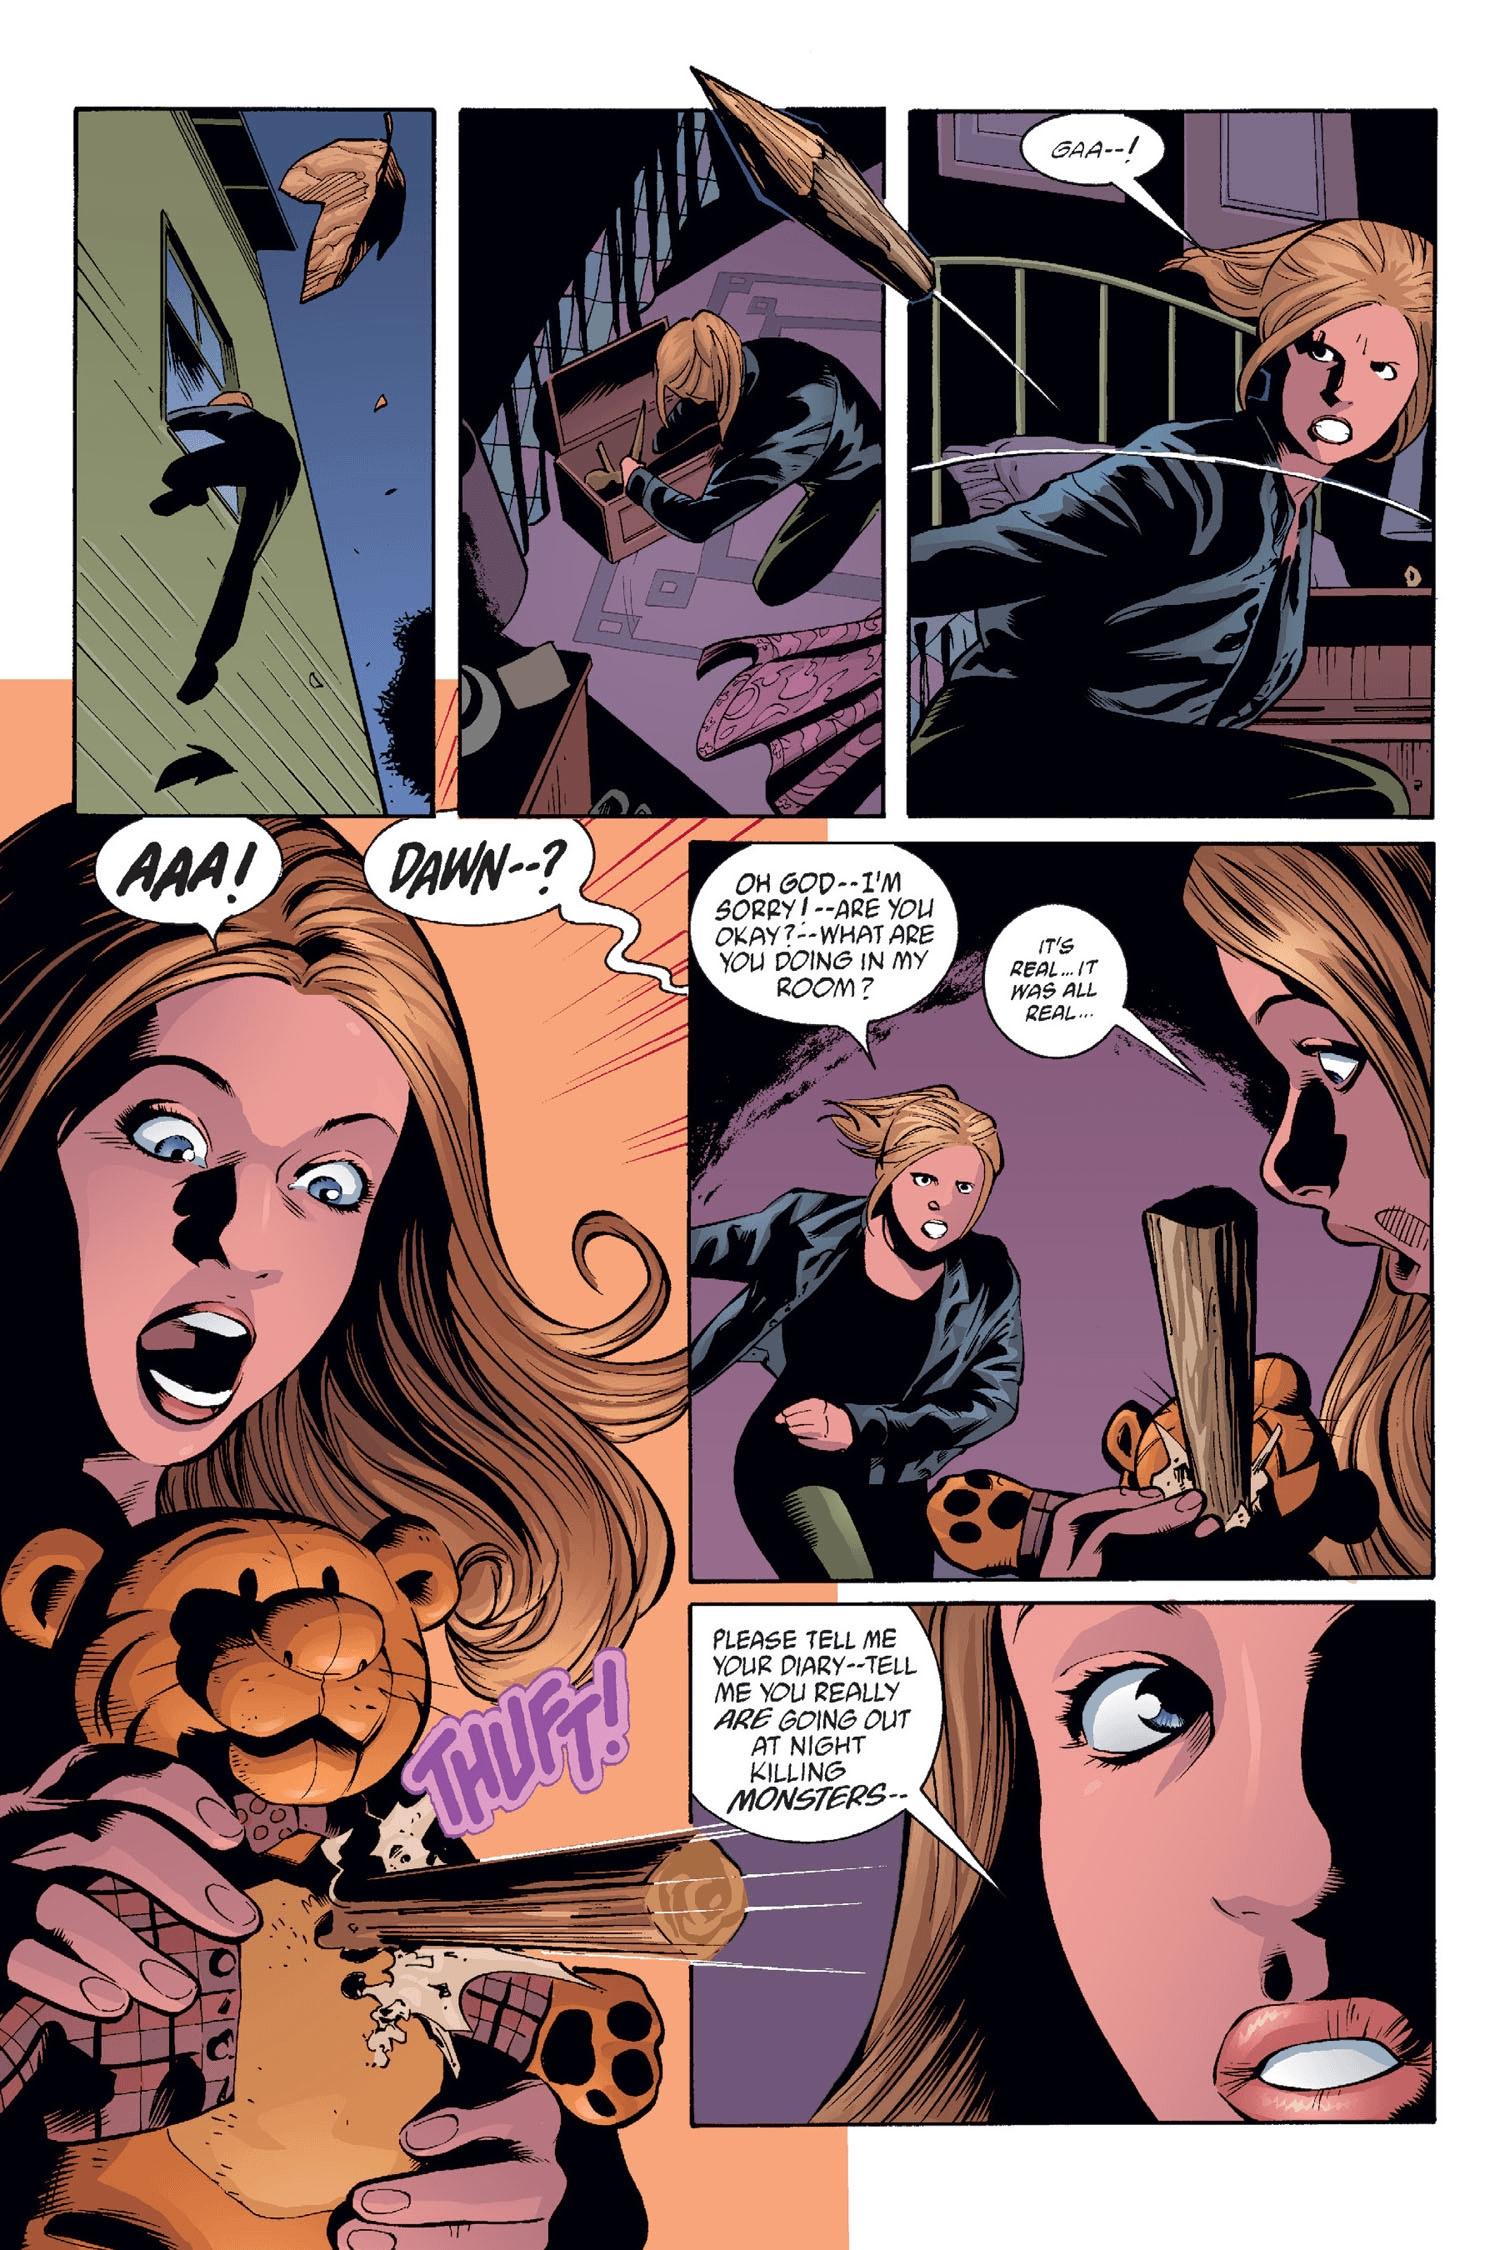 Read online Buffy the Vampire Slayer: Omnibus comic -  Issue # TPB 2 - 26